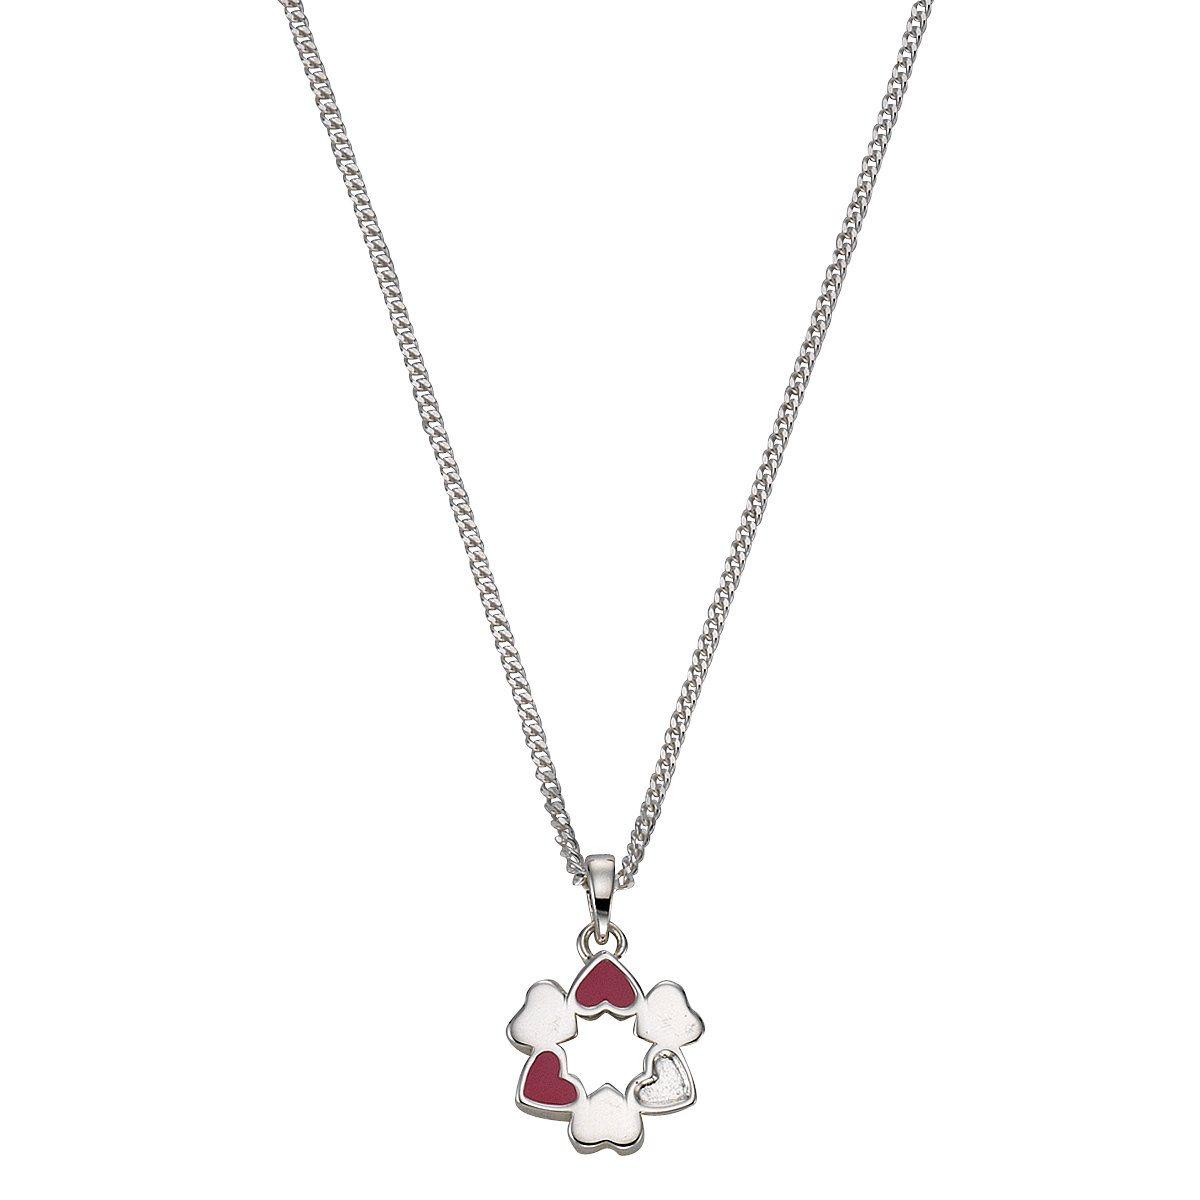 Zeeme Anhänger mit Kette »925/- Sterling Silber Lack Herzen« | Schmuck > Halsketten > Herzketten | Silber - Rosa - Weiß | Zeeme